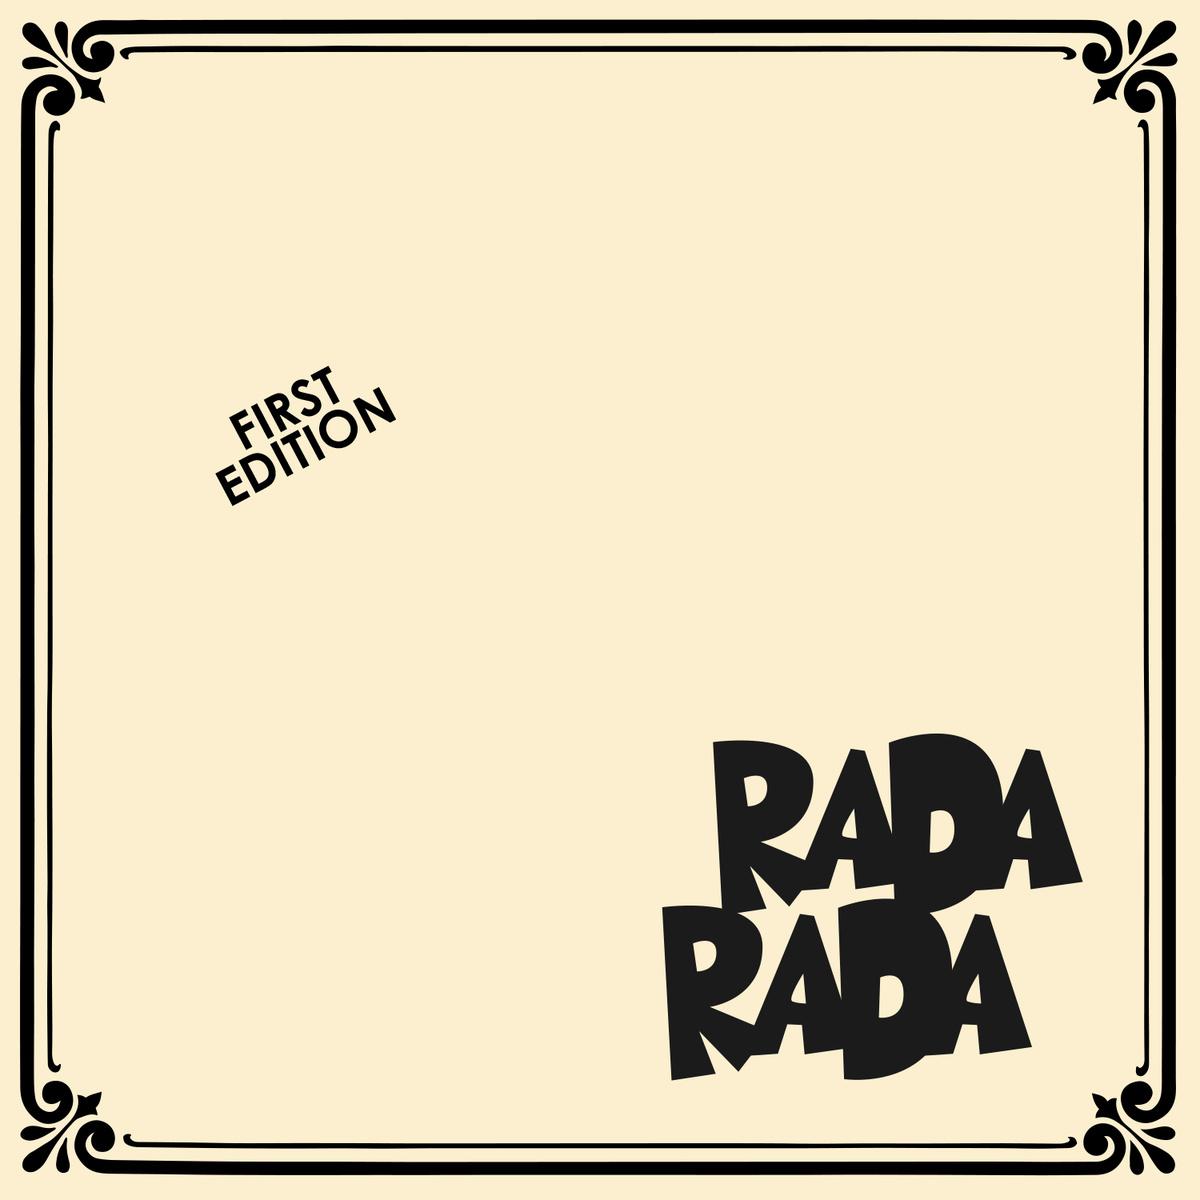 Radarada – First Edition